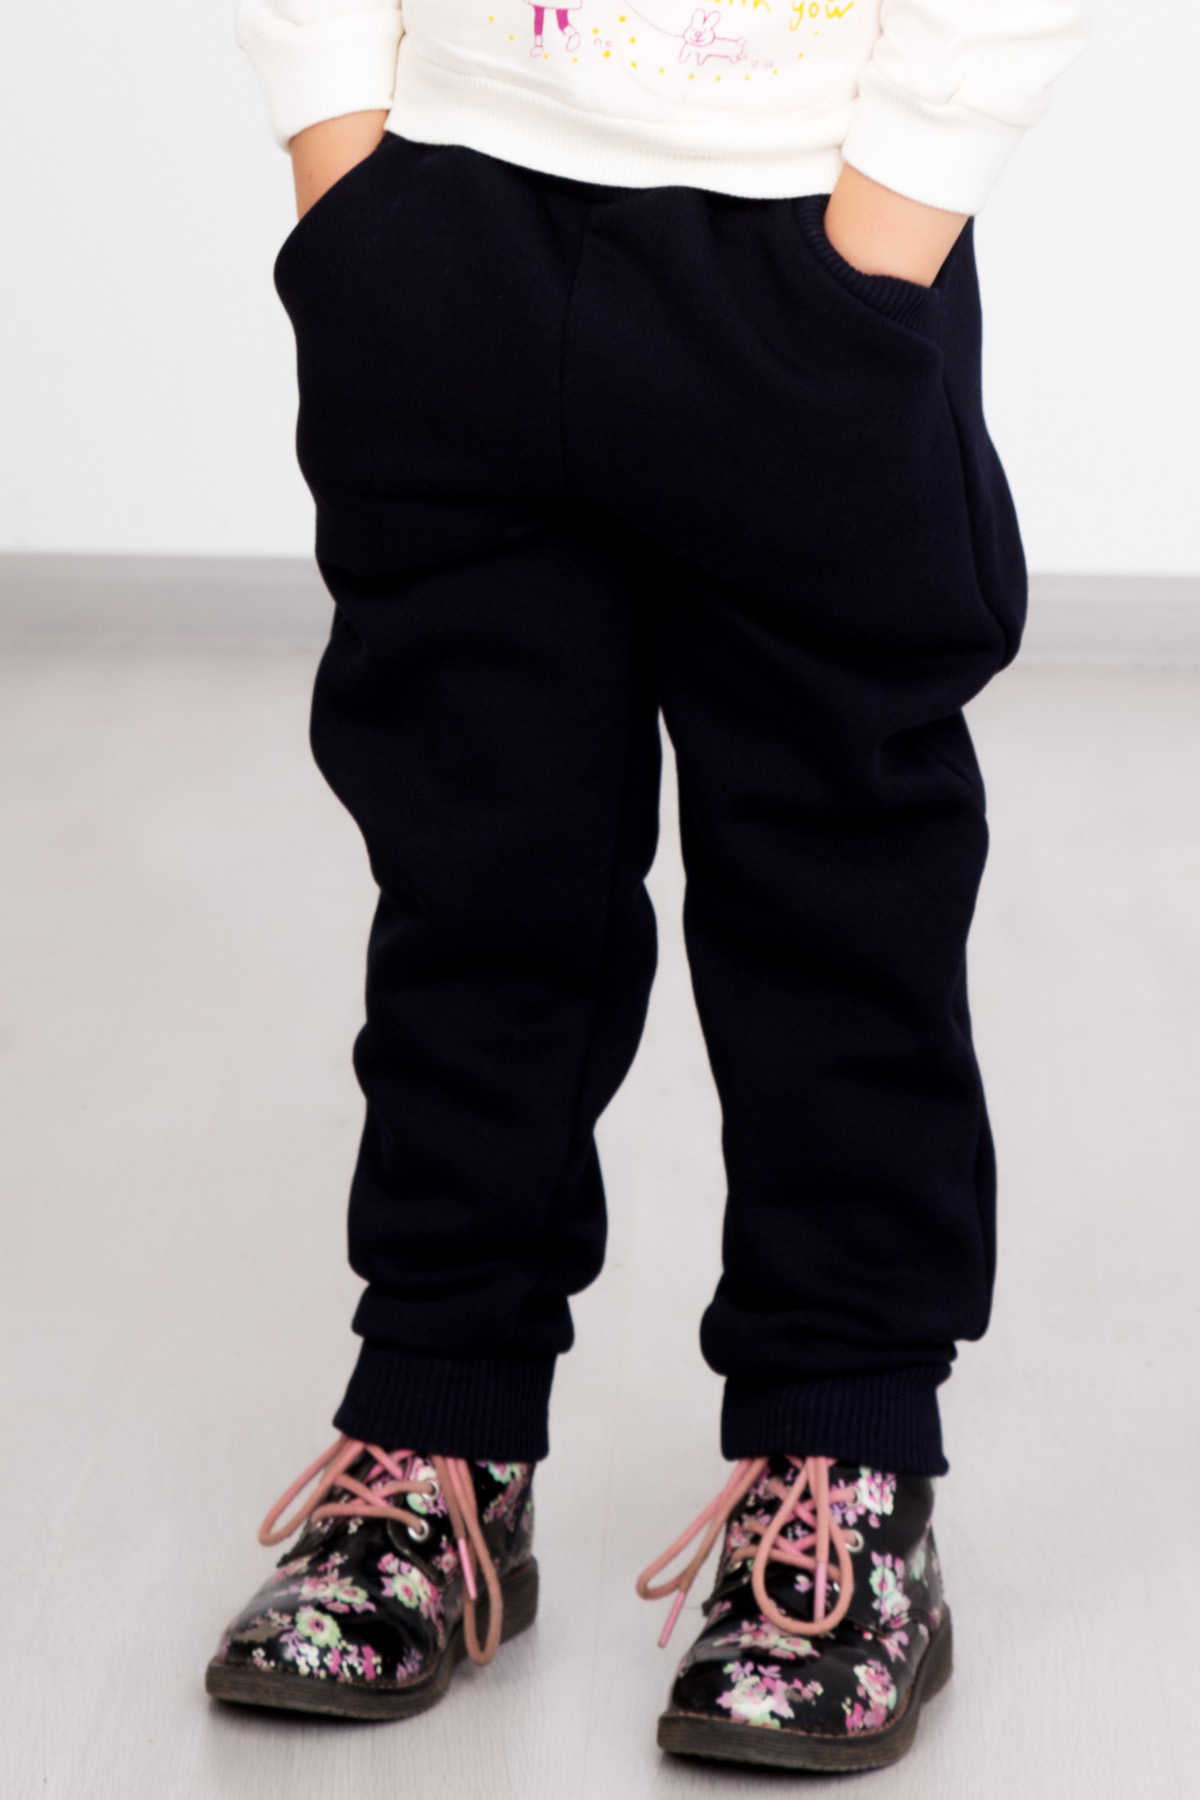 Дет. брюки Снег р. 38Шорты, бриджи, брюки<br><br><br>Тип: Дет. брюки<br>Размер: 38<br>Материал: Футер